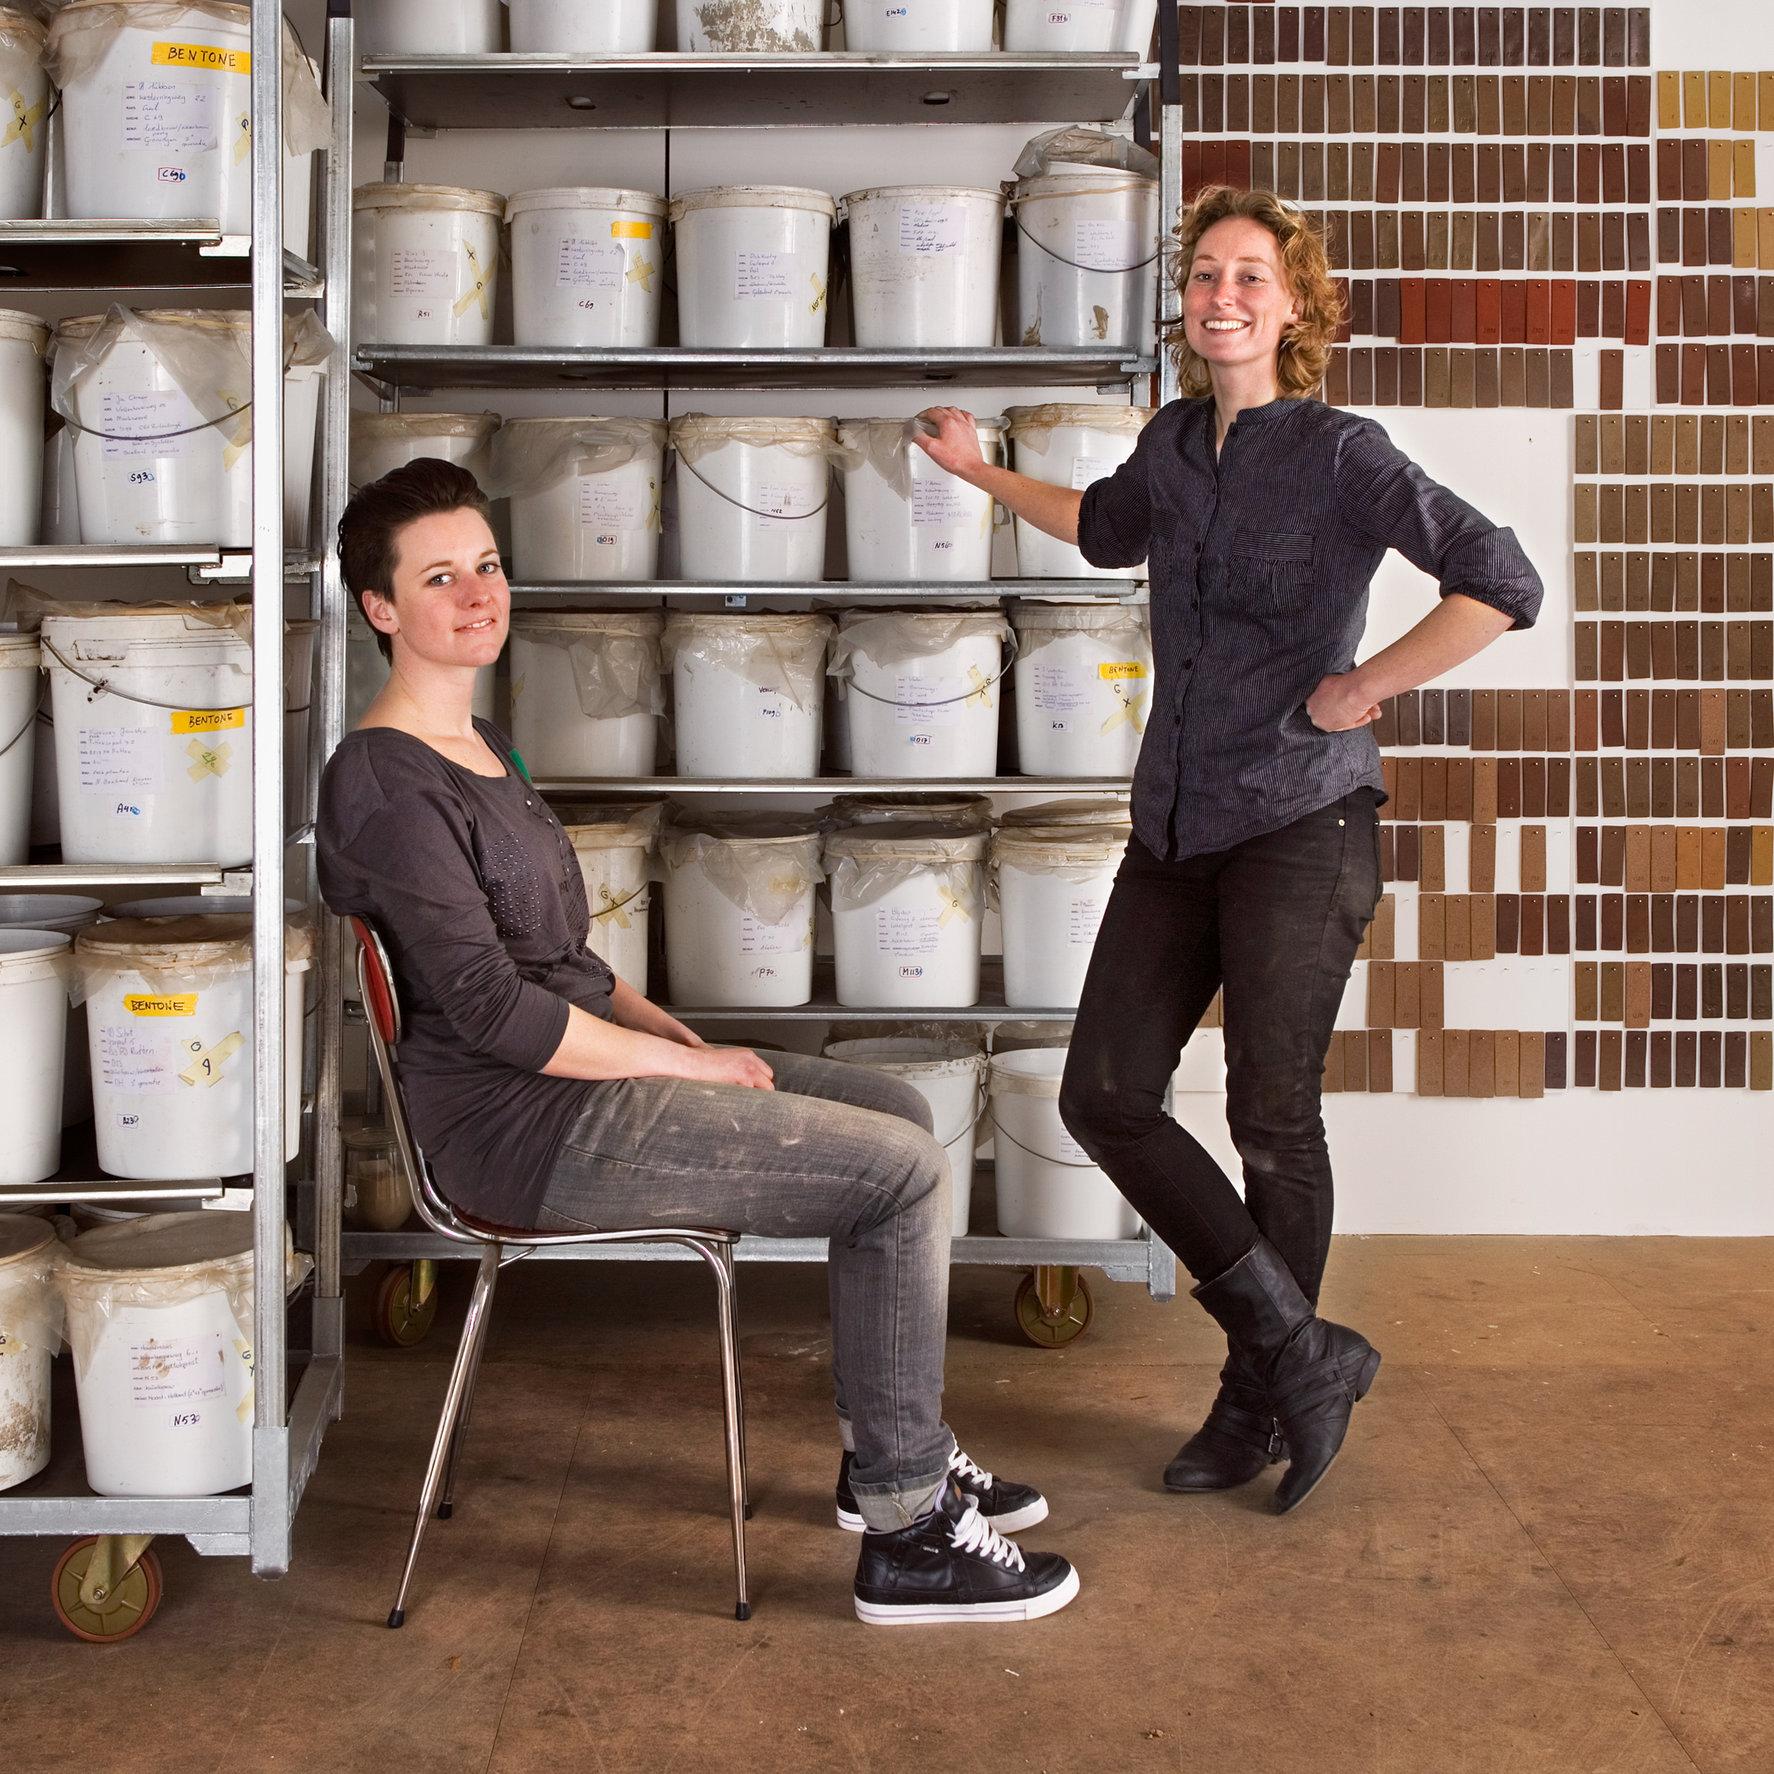 AtelierNL, designers